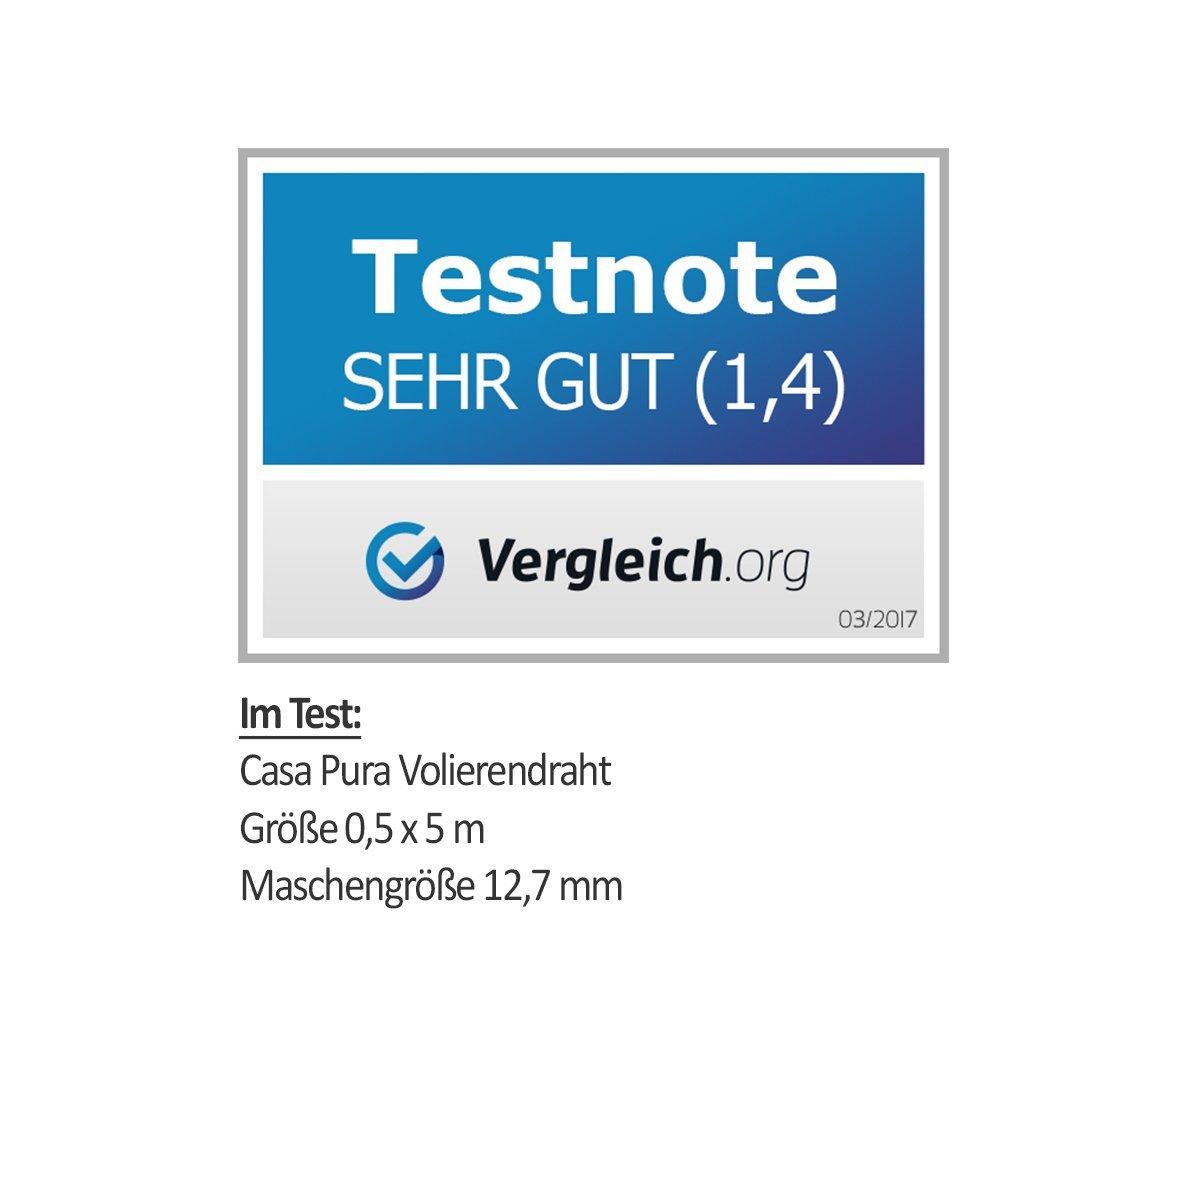 casa pura® Drahtgitter | Testnote 1,4 | 4-Eck-Geflecht Drahtzaun ...